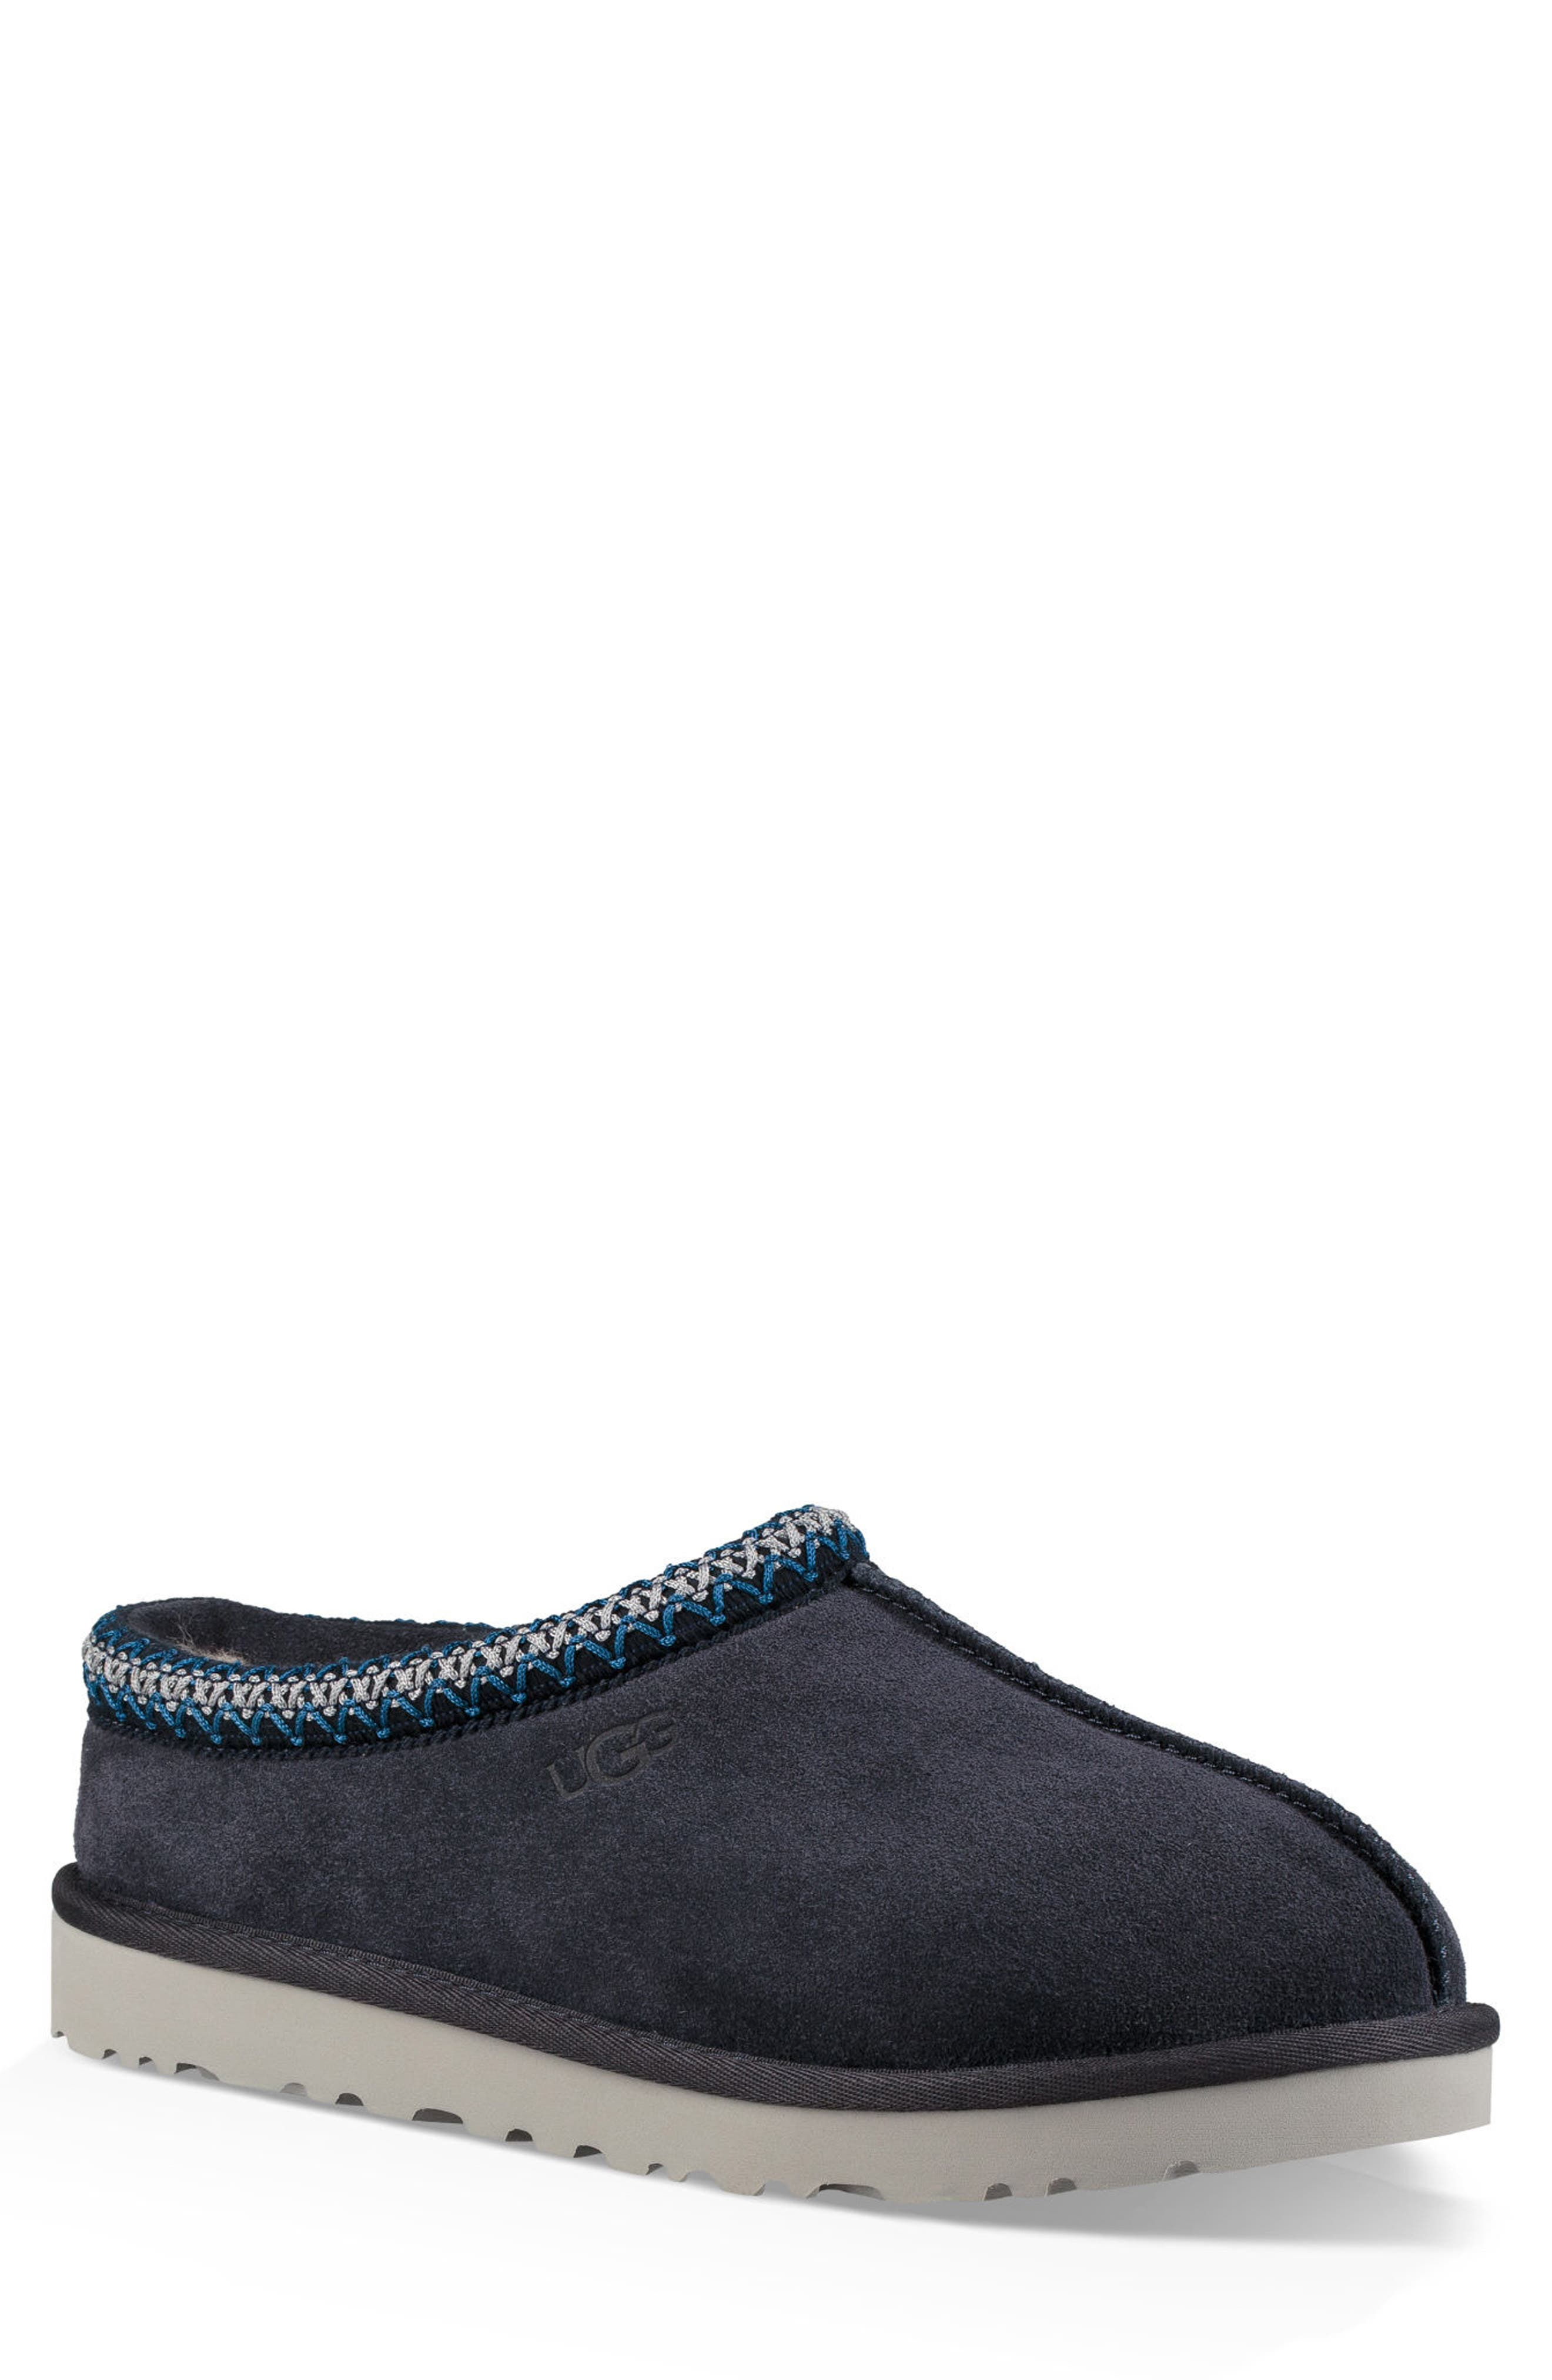 UGG<SUP>®</SUP> 'Tasman' Slipper, Main, color, TRUE NAVY